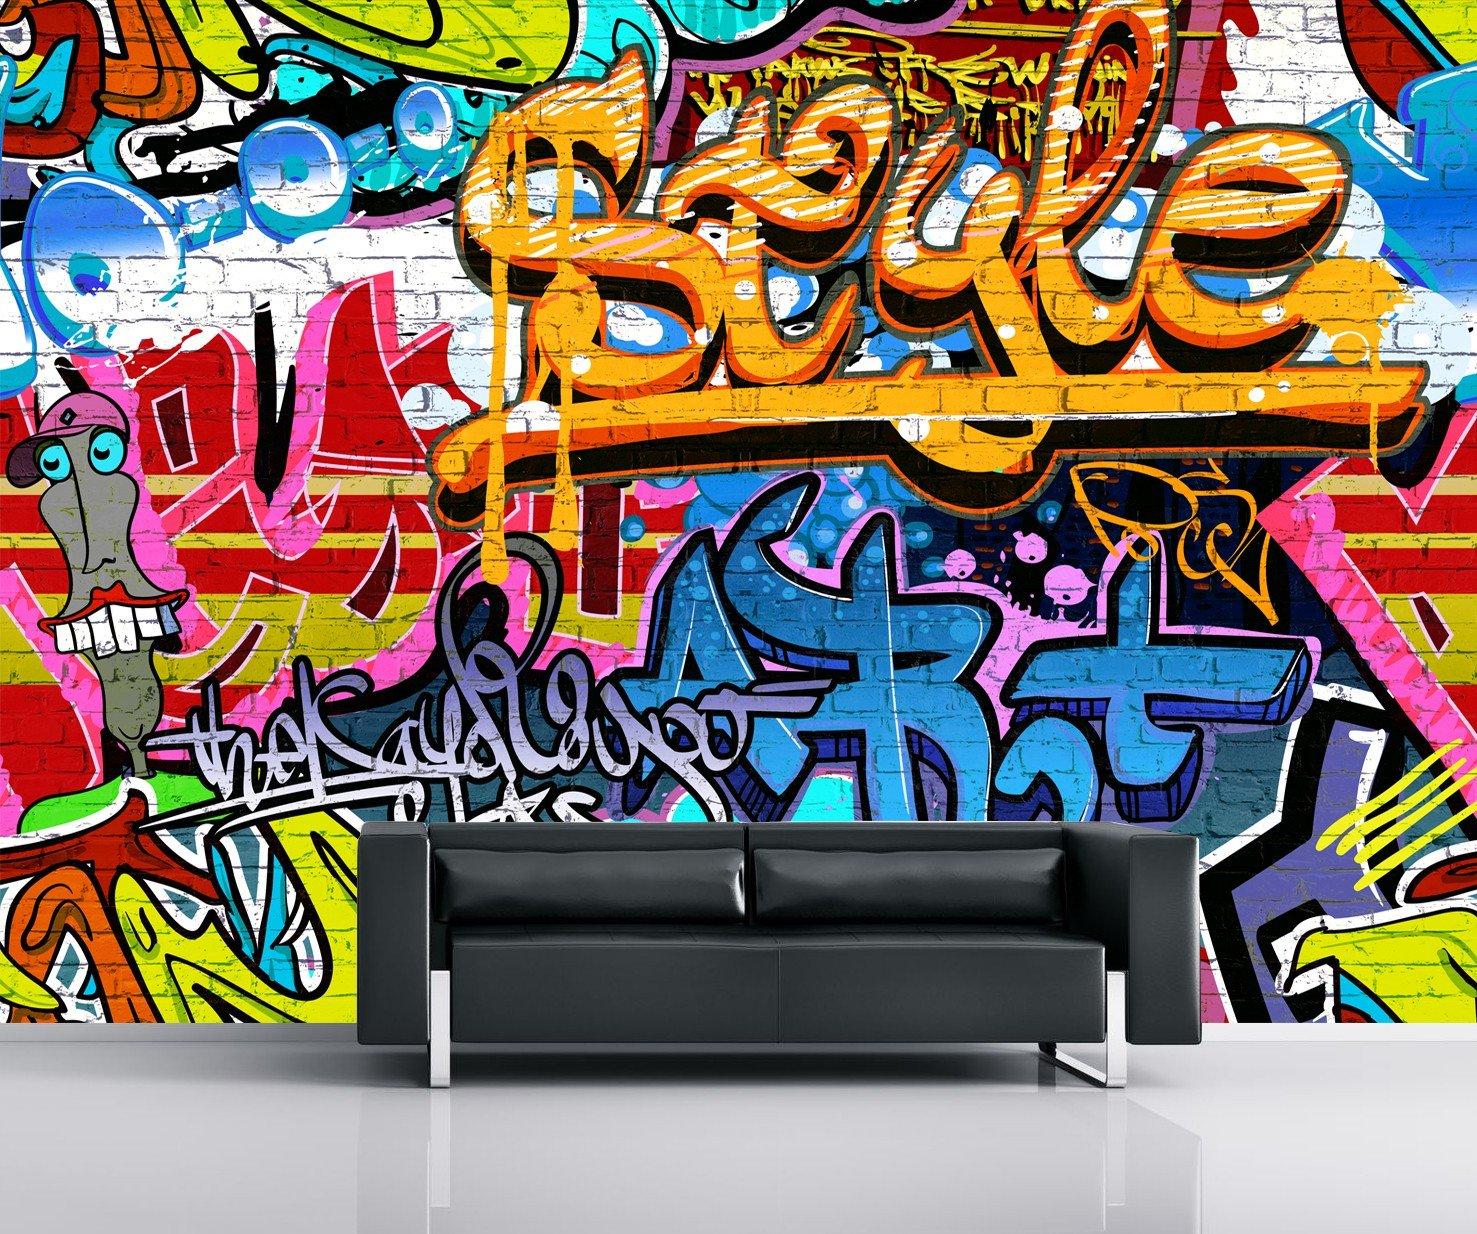 graffiti wall mural amazon co uk1 wall brightly coloured street graffiti feature wallpaper mural 3 15 x 2 32m, wood,